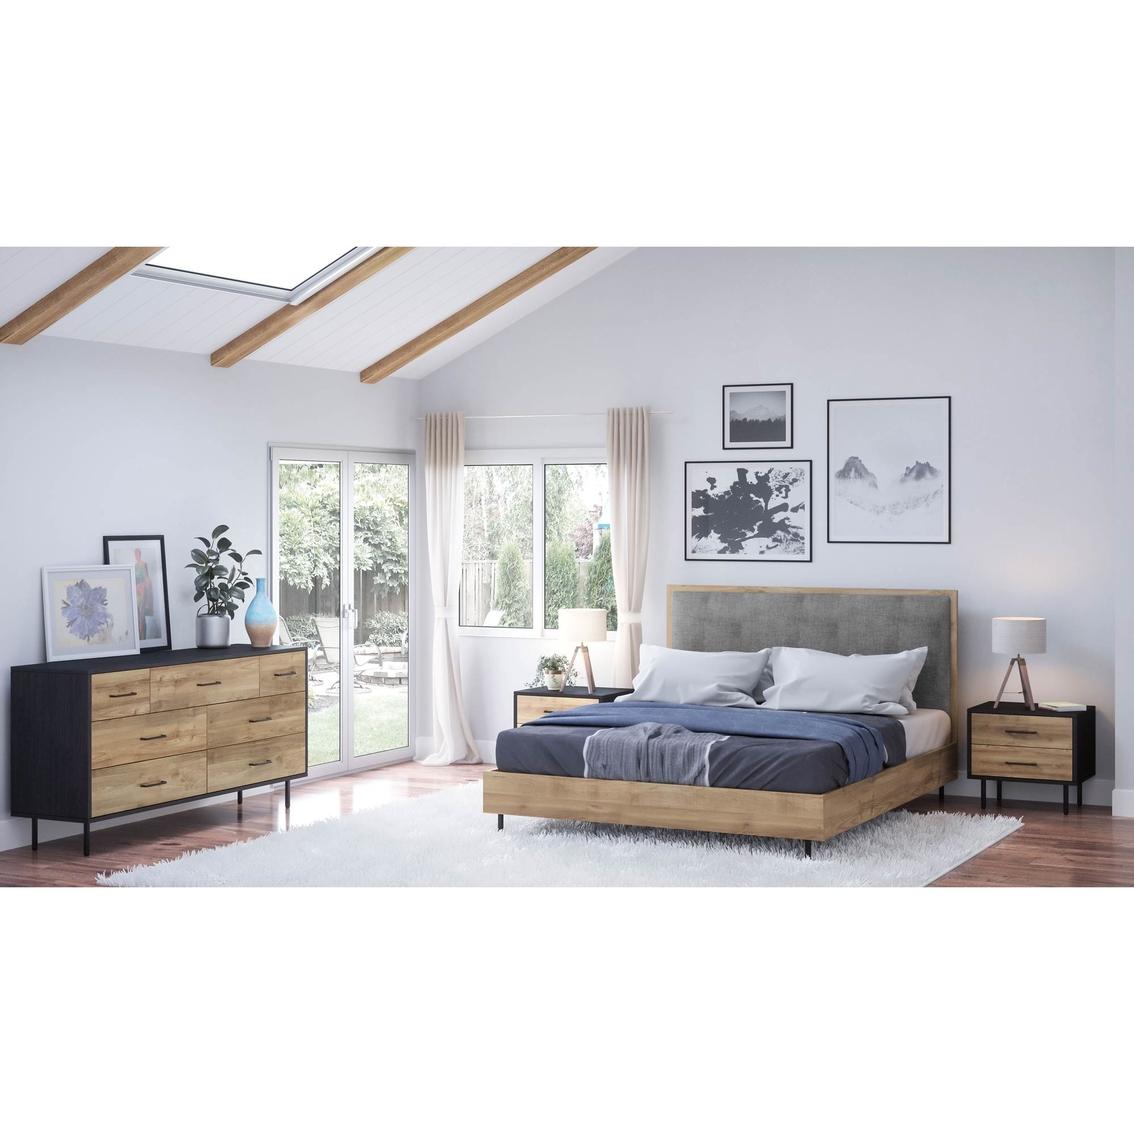 Abbyson Fresco Mid Century 4 Pc. Bedroom Set | Bedroom Sets ...